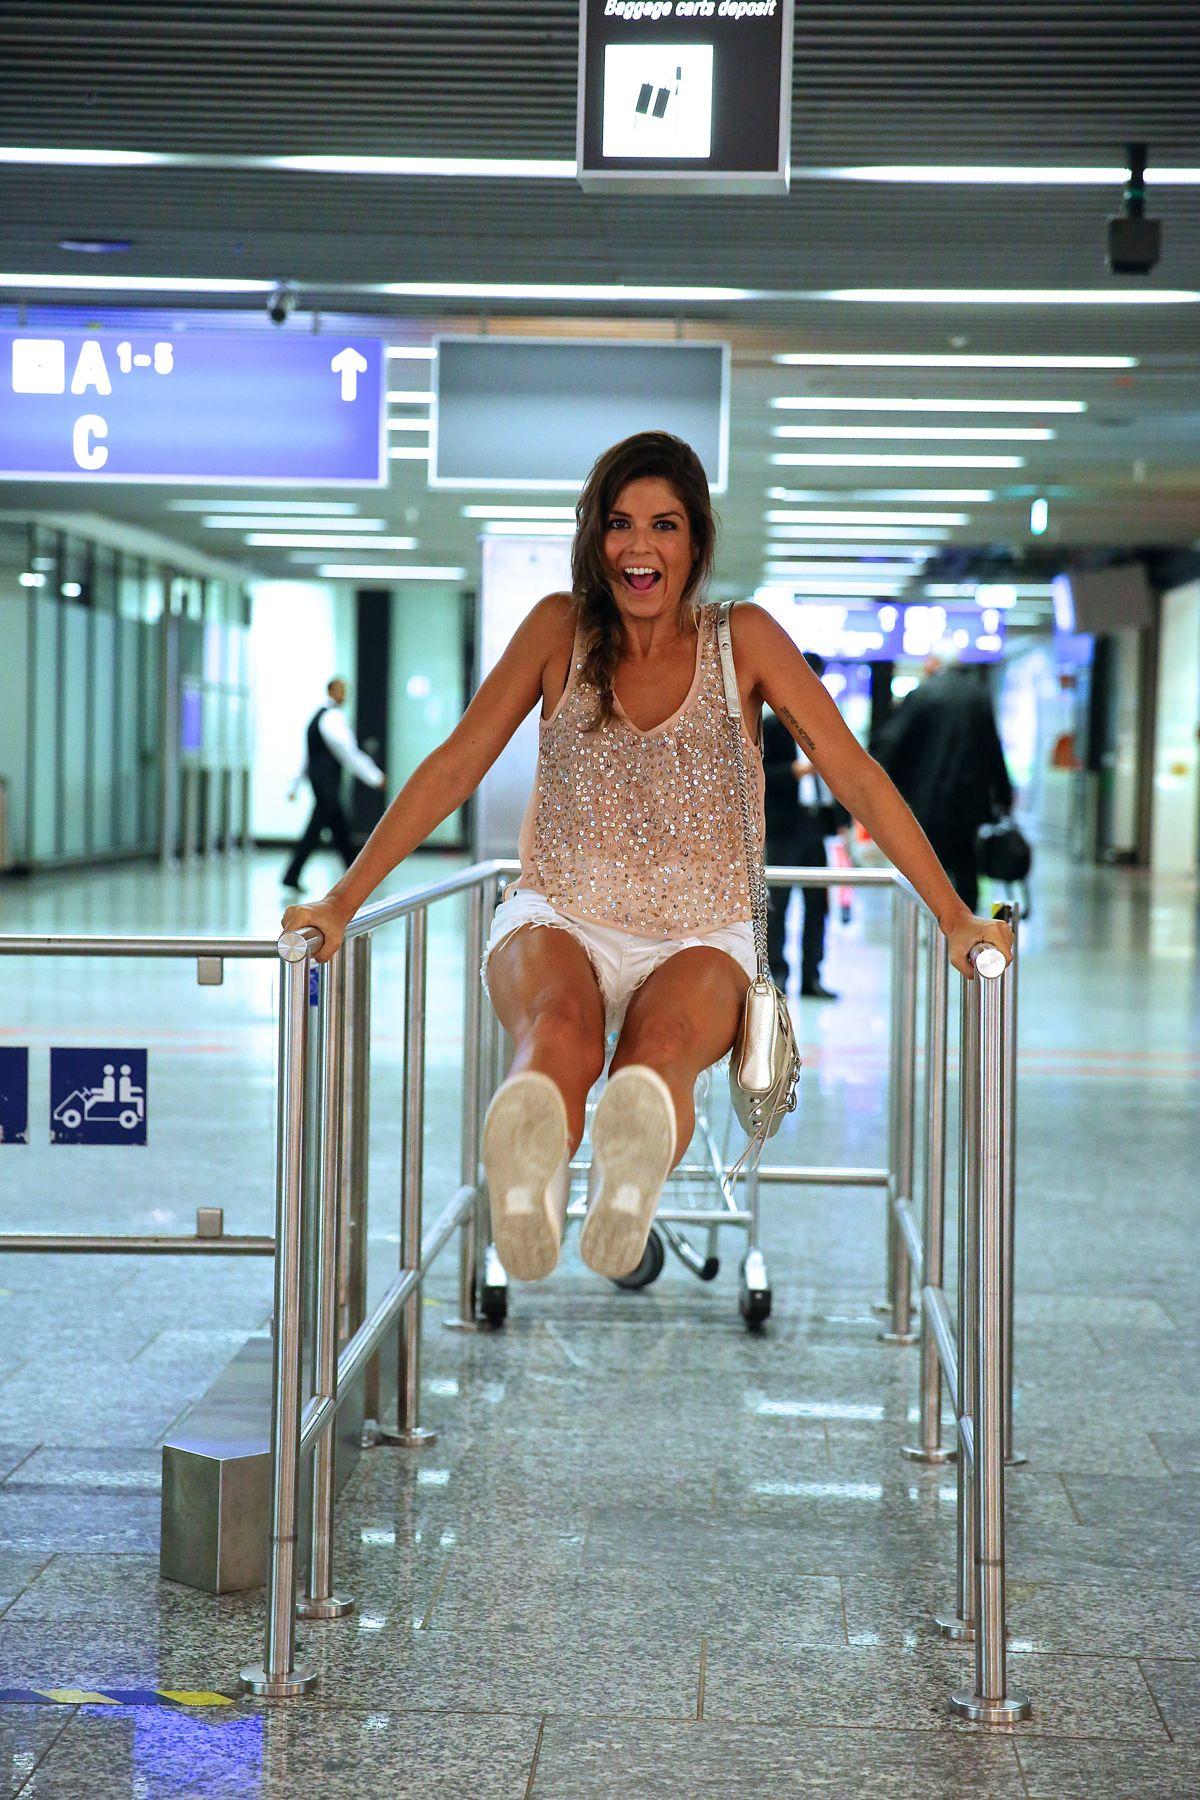 trendy_taste-look-outfit-street_style-ootd-blog-blogger-fashion_spain-moda_españa-traveling-viaje-frankfurt-stan_smith-adidas-lentejuelas-top-denim-shorts-vaqueros_rotos-14